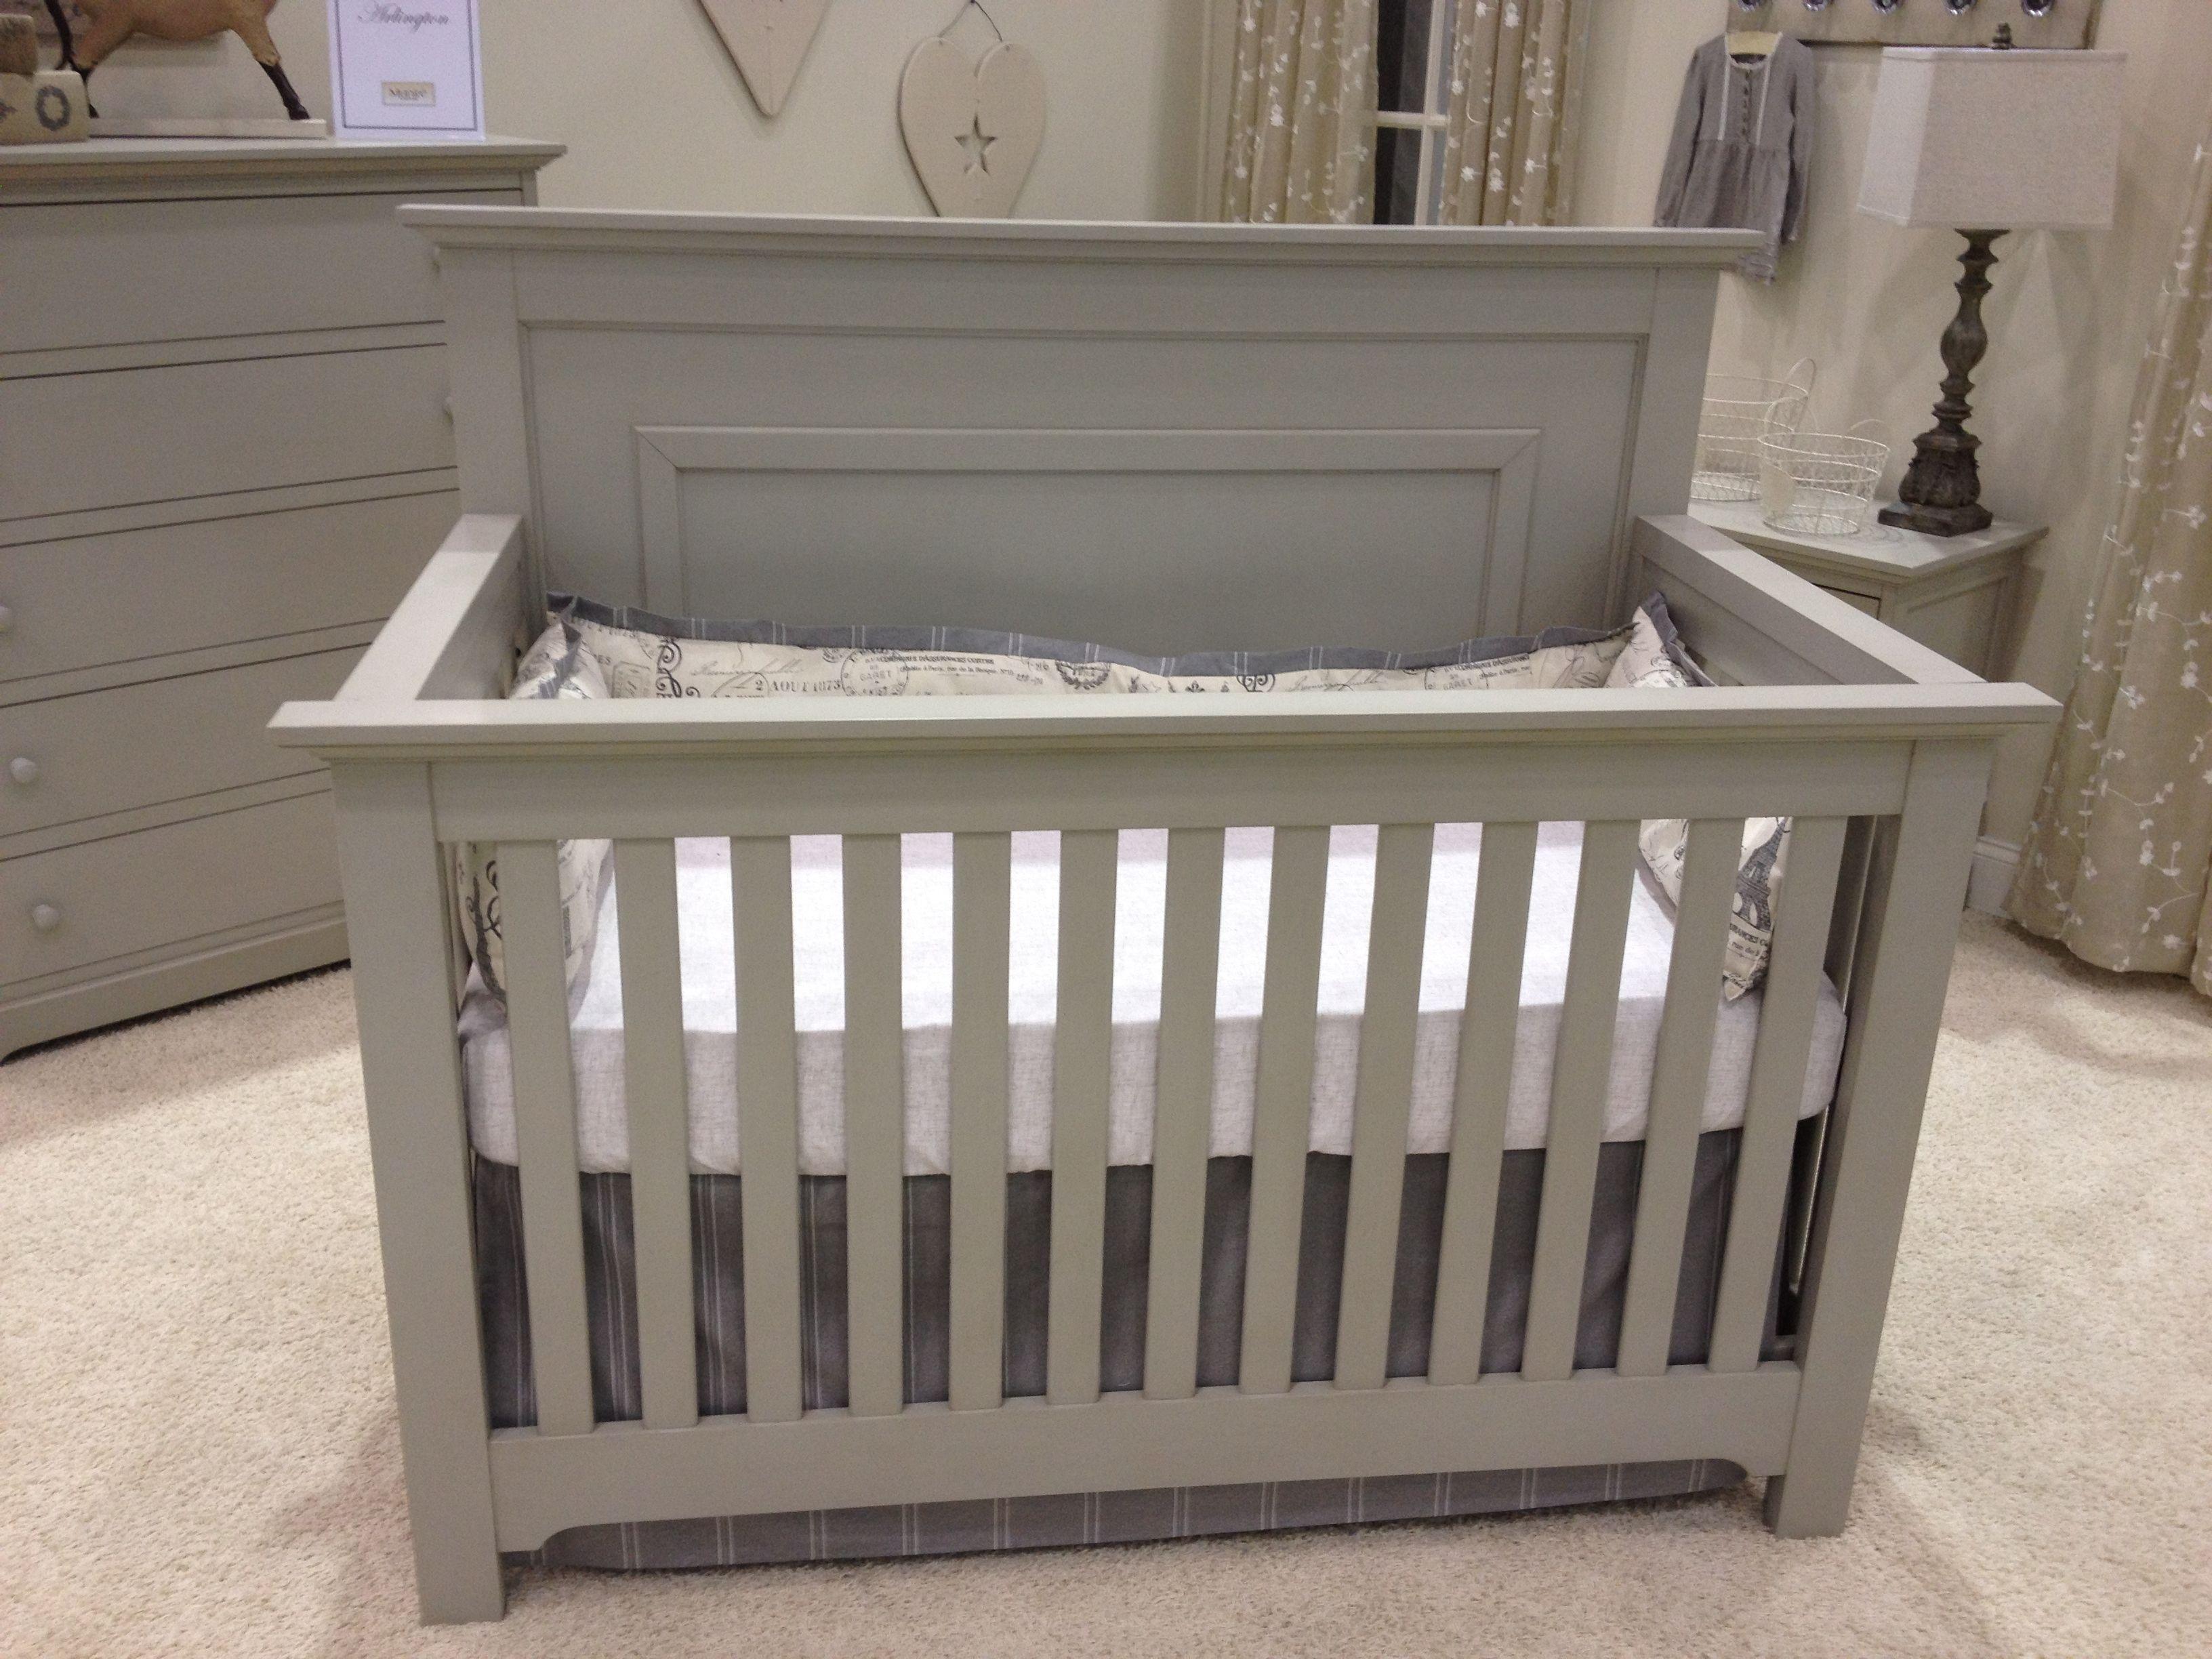 chesapeake collection from munire furniture in grey crib nursery baby munire debnheir. Black Bedroom Furniture Sets. Home Design Ideas